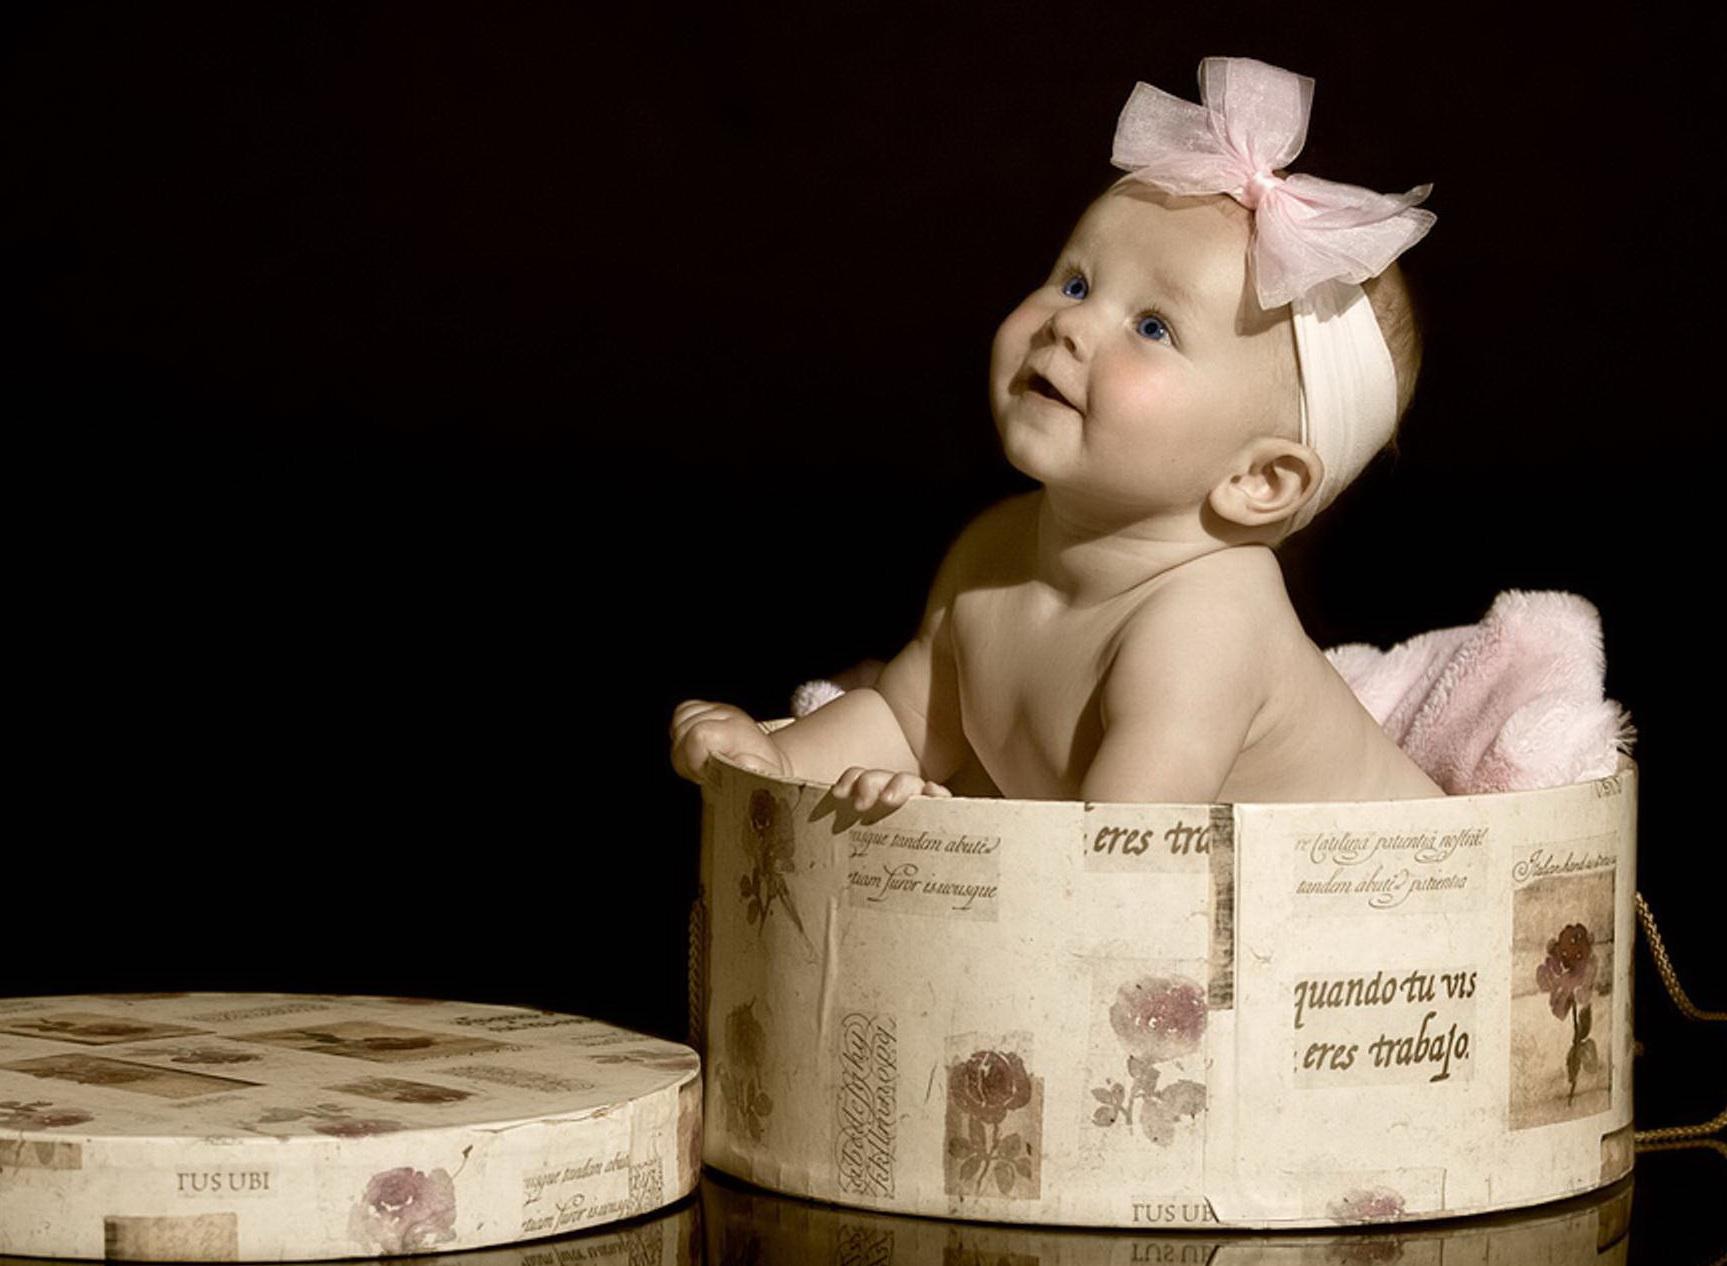 Малыш 1727 x 1266